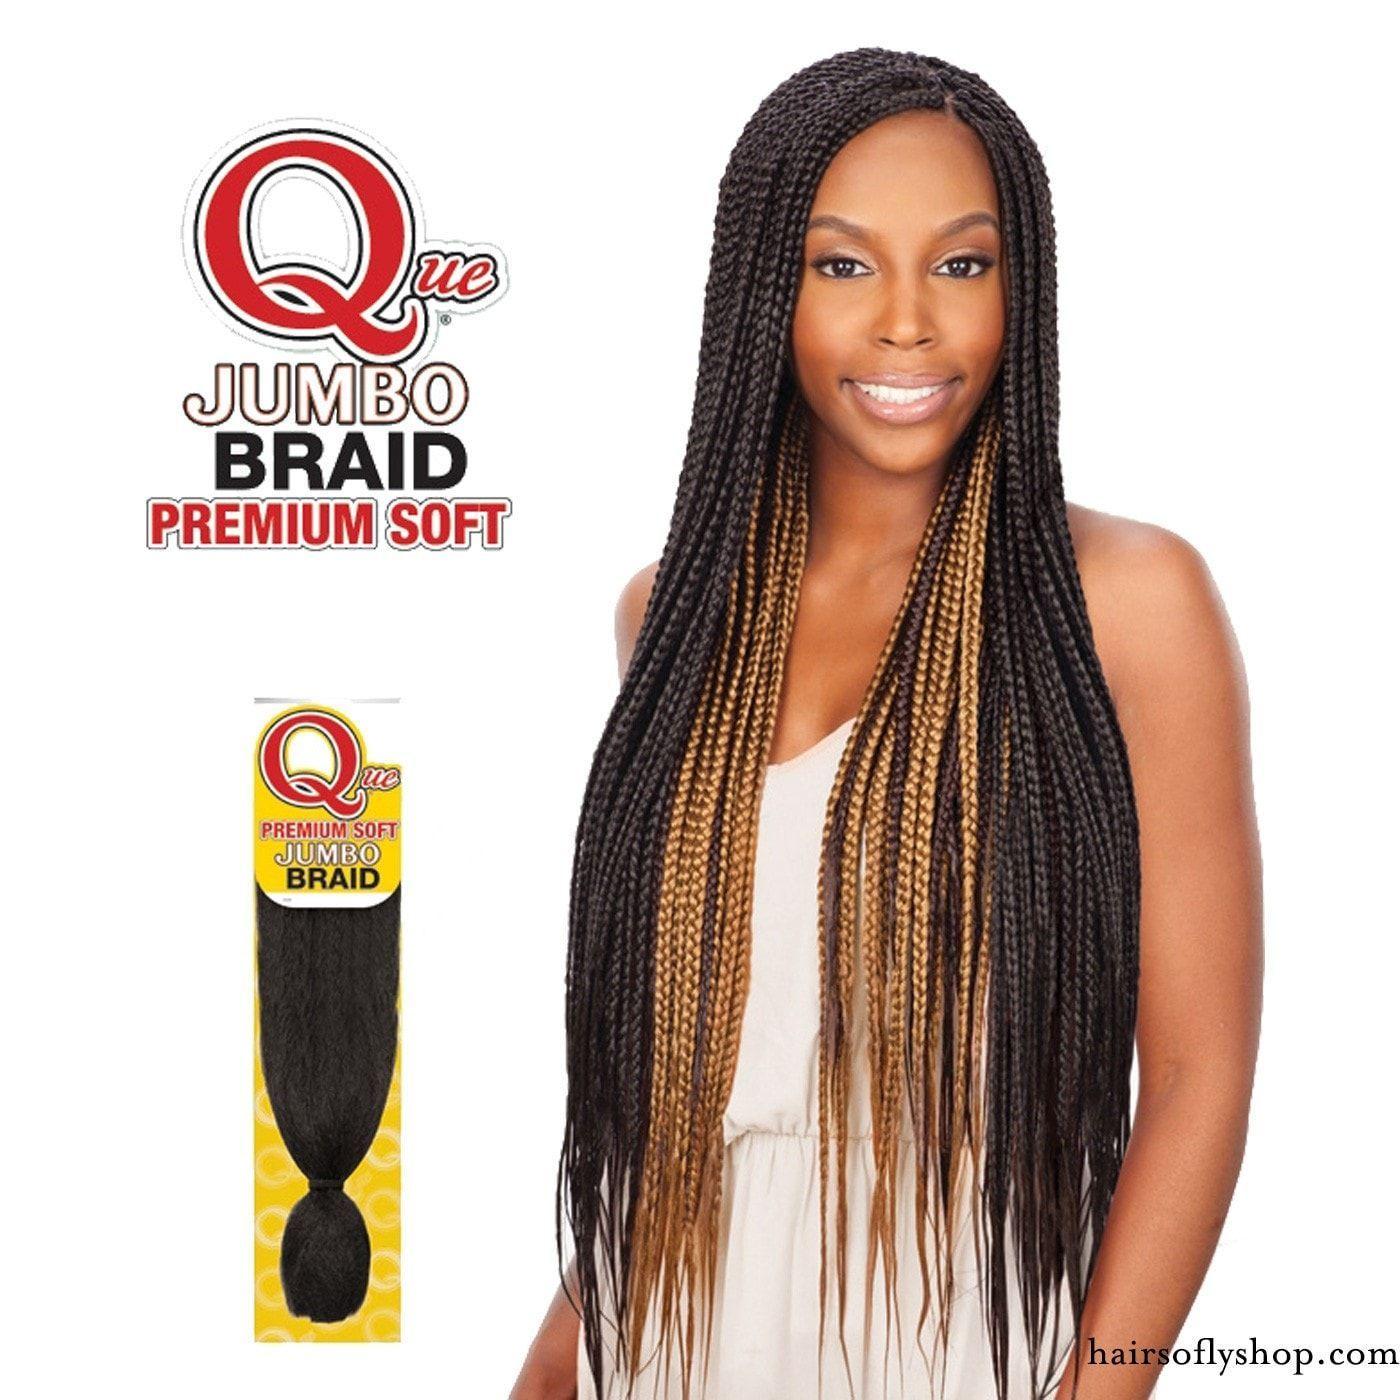 Que Kanekalon Premium Soft Jumbo Braid Box Braids Hairstyles